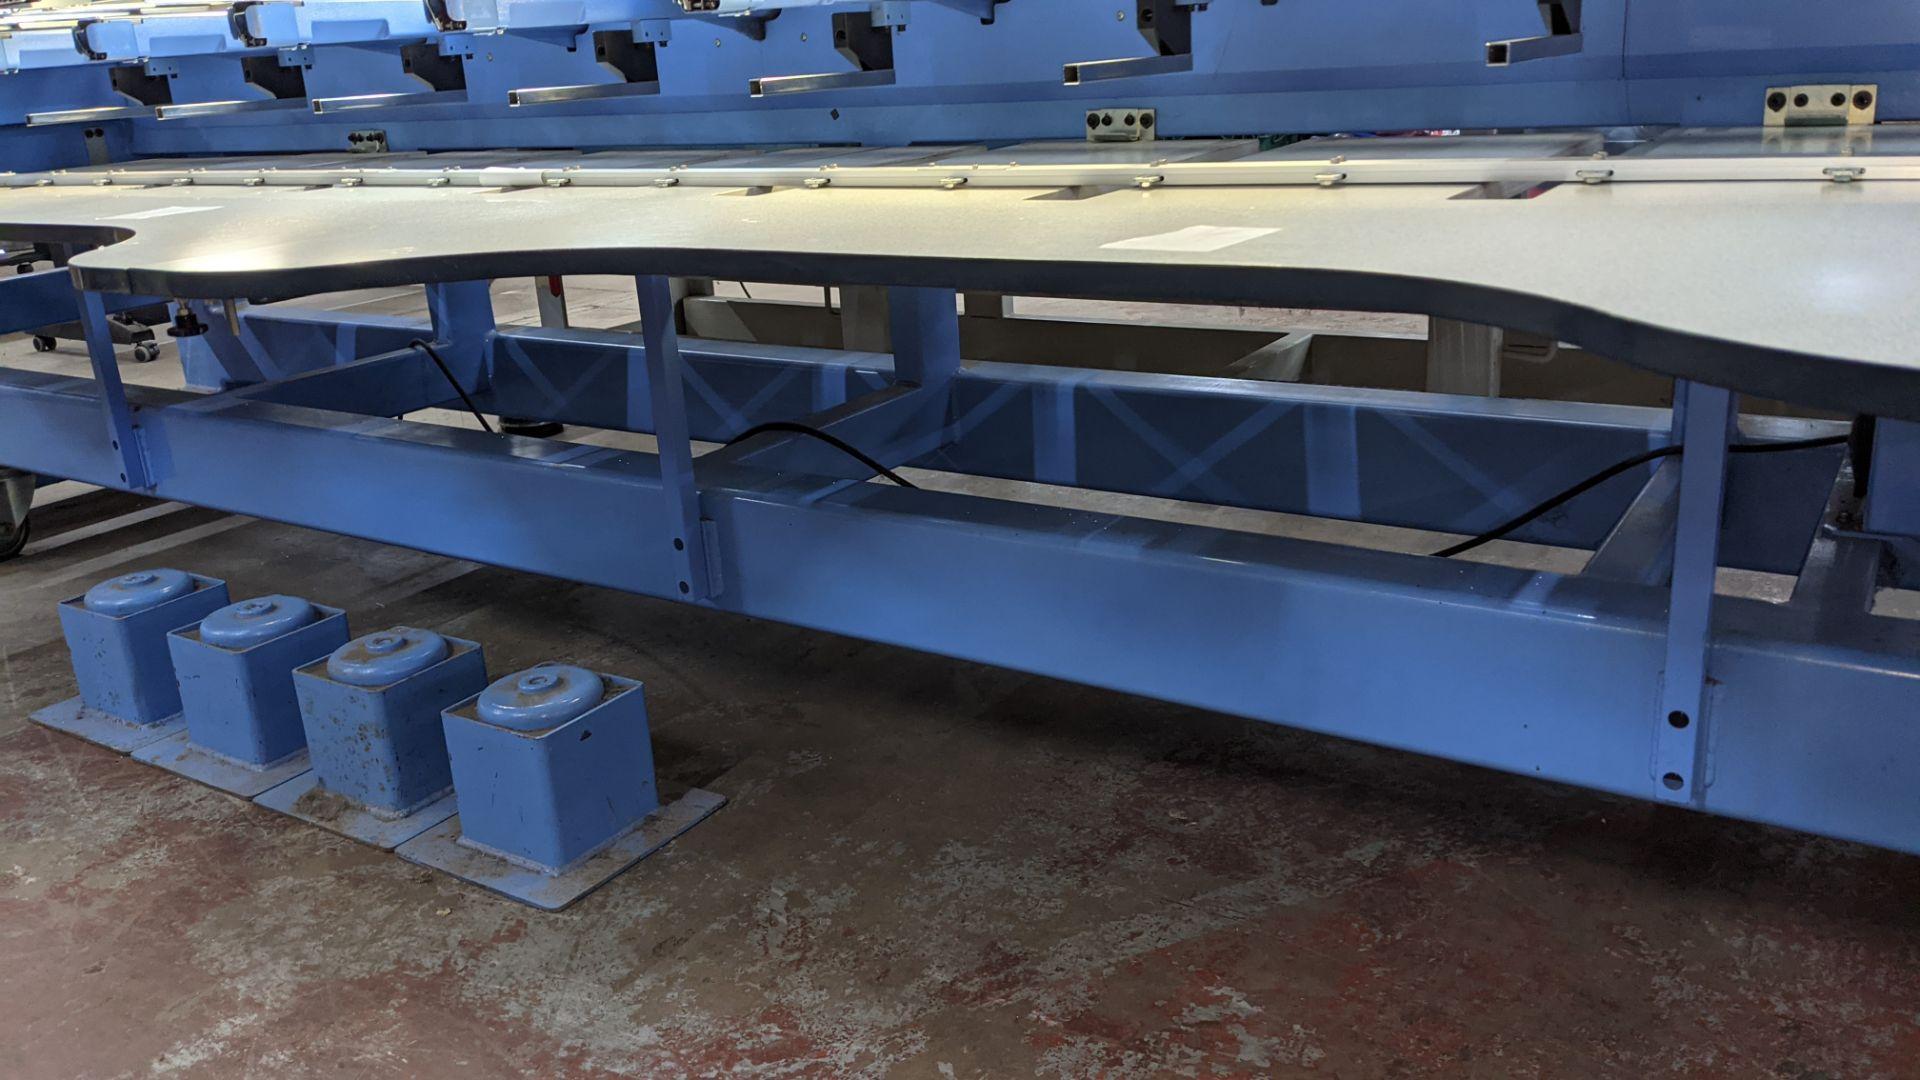 Happy 8 head embroidery machine, model HCG-1508B-45TTC, 15 needles per head, including frames & othe - Image 16 of 32